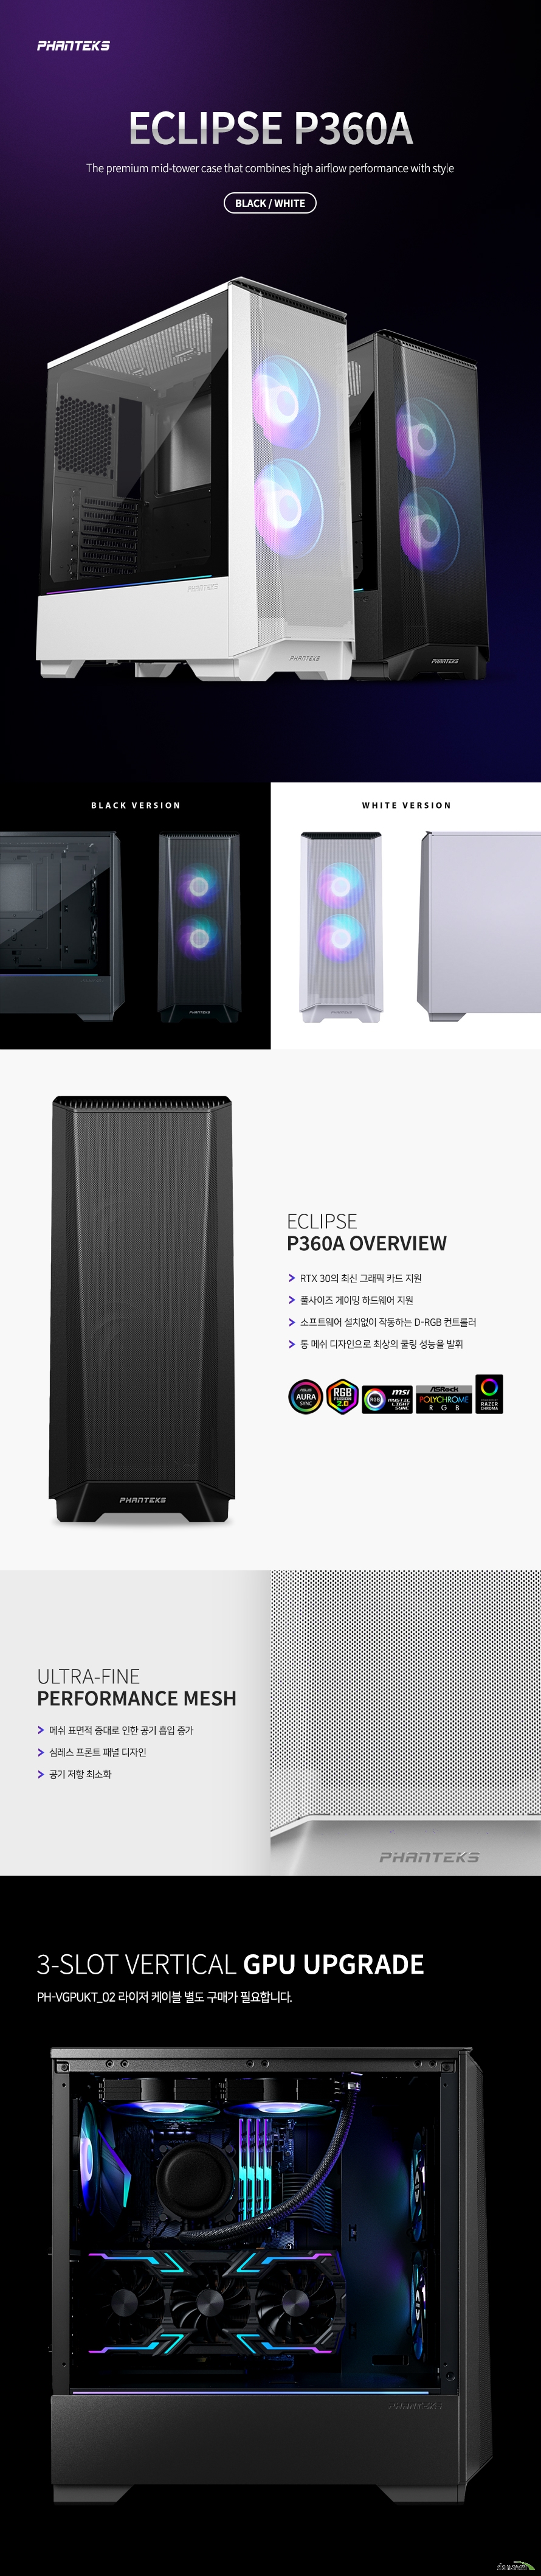 ECLIPSE P360A The premium mid-tower case that combines high airflow performance with style BLACK / White  ECLIPSE  P360A OVERVIEW RTX 30의 최신 그래픽 카드 지원 풀사이즈 게이밍 하드웨어 지원 소프트웨어 설치없이 작동하는 D-RGB 컨트롤러 통 메쉬 디자인으로 최상의 쿨링 성능을 발휘  ULTRA-FINE  PERFORMANCE MESH 메쉬 표면적 증대로 인한 공기 흡입 증가 심레스 프론트 패널 디자인 공기 저항 최소화  3-Slot Vertical GPU UPGRADE PH-VGPUKT_02 라이저 케이블 별도 구매가 필요합니다.  STORAGE SUPPORT 2.5인치 브래킷 2개 기본 제공 / 3.5인치 하드디스크 트레이 2개 지원  HDD 트레이 2개 기본 내장 하드 디스크를 간편하게 설치할 수 있는 HDD 트레이가 내장되어 있습니다.  FAN SUPPORT 140 mm 팬 4개 / 120 mm 팬 5개 설치 가능   RADIATOR SUPPORT 상단 240mm / 전면 240,280mm / 후면 120mm 라디에이터 설치 가능  부드러운 컬러의 D-RGB PWM 쿨링팬 지원 D-RGB 120mm 팬을 기본 2개 지원합니다. (SK 3Pin)  심플하고 감각적인 버튼, 포트 디자인 상단에 전원 버튼과 LED 컬러, 모드 조절 버튼 USB 3.0 포트 2개, 마이크/헤드폰 잭을 지원합니다.  파워 서플라이 설치 가이드 지원 하단 흡기, 상단 흡기를 사용자가 원하는대로 결정하여 자유롭게 설치할 수 있습니다,   상단 먼지 필터 기본 장착 외부 유입 먼지를 효과적으로 청소 및 관리할 수 있도록 먼지 필터를 기본 지원합니다.  SPECIFICATION  케이스 크기 (W x H x D) 455 mm x 200 mm x 465 mm   폼팩터 Mid Tower 재질 스틸, 강화유리 메인보드 호환 규격  E-ATX , ATX, micro-ATX, mini-ITX (E-ATX up to 280mm wide)  상단 I/O 2 x USB 3.0 마이크 / 헤드폰 파워 버튼 D-RGB 모드 / 컬러 컨트롤 버튼  커넥터 Power-Switch D-RGB Expansion D-RGB Third Party D-RGB MB Adapter HD-audio USB 3.0 SATA Power   PCI 슬롯 7 수직 VGA 설치 가능, Vertical GPU Bracket 구매 필요  내부 3.5인치 베이 2 (2 x included, also supports 2.5